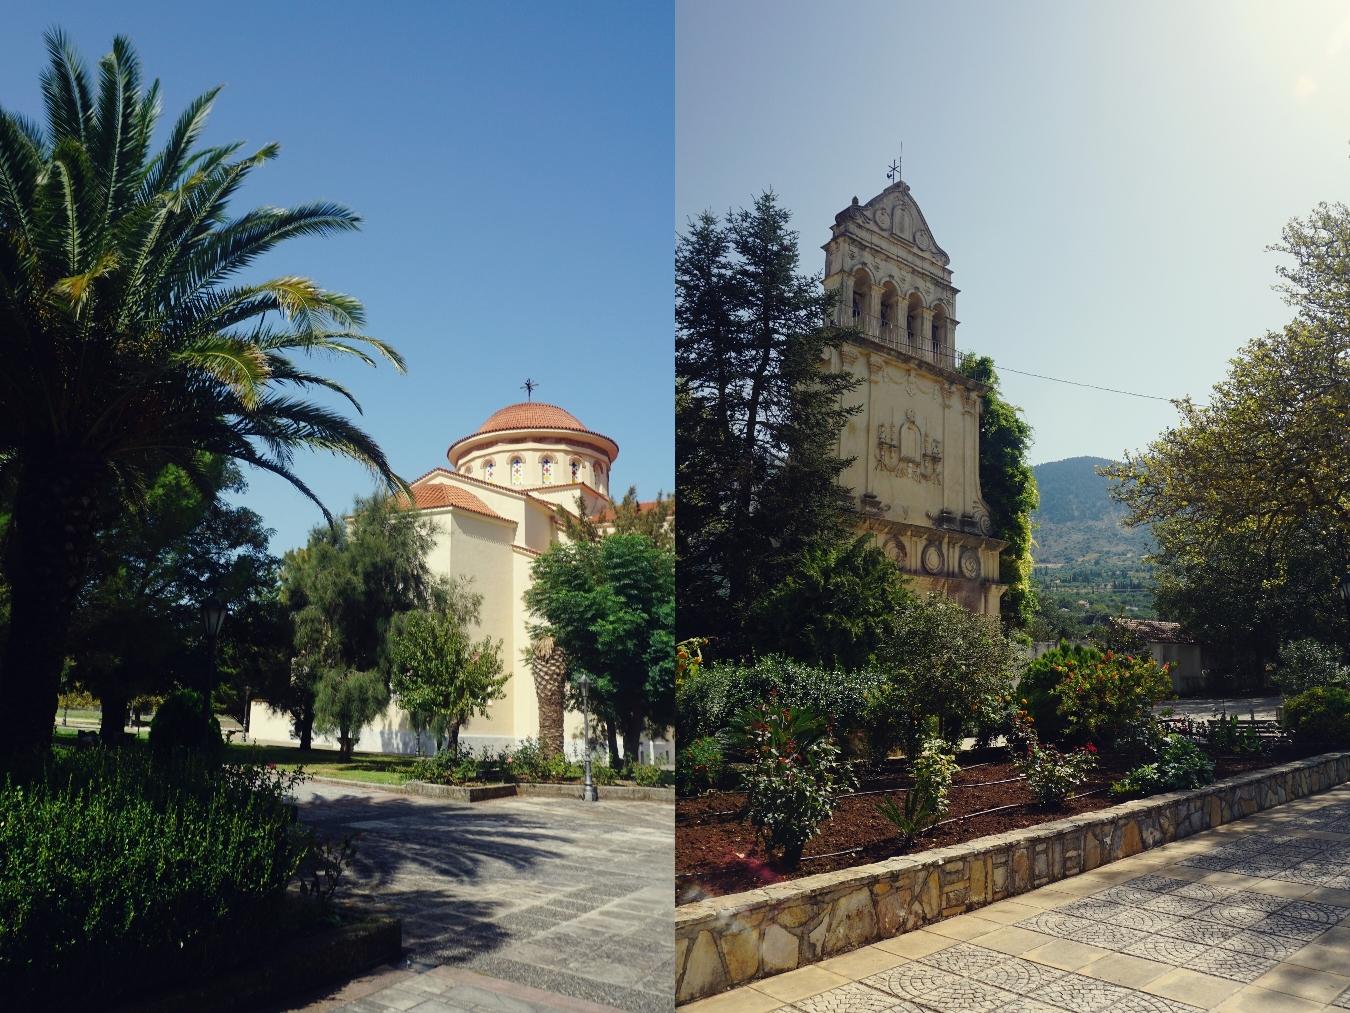 Monastyr, cerkiew, Grecja, Kefalonia